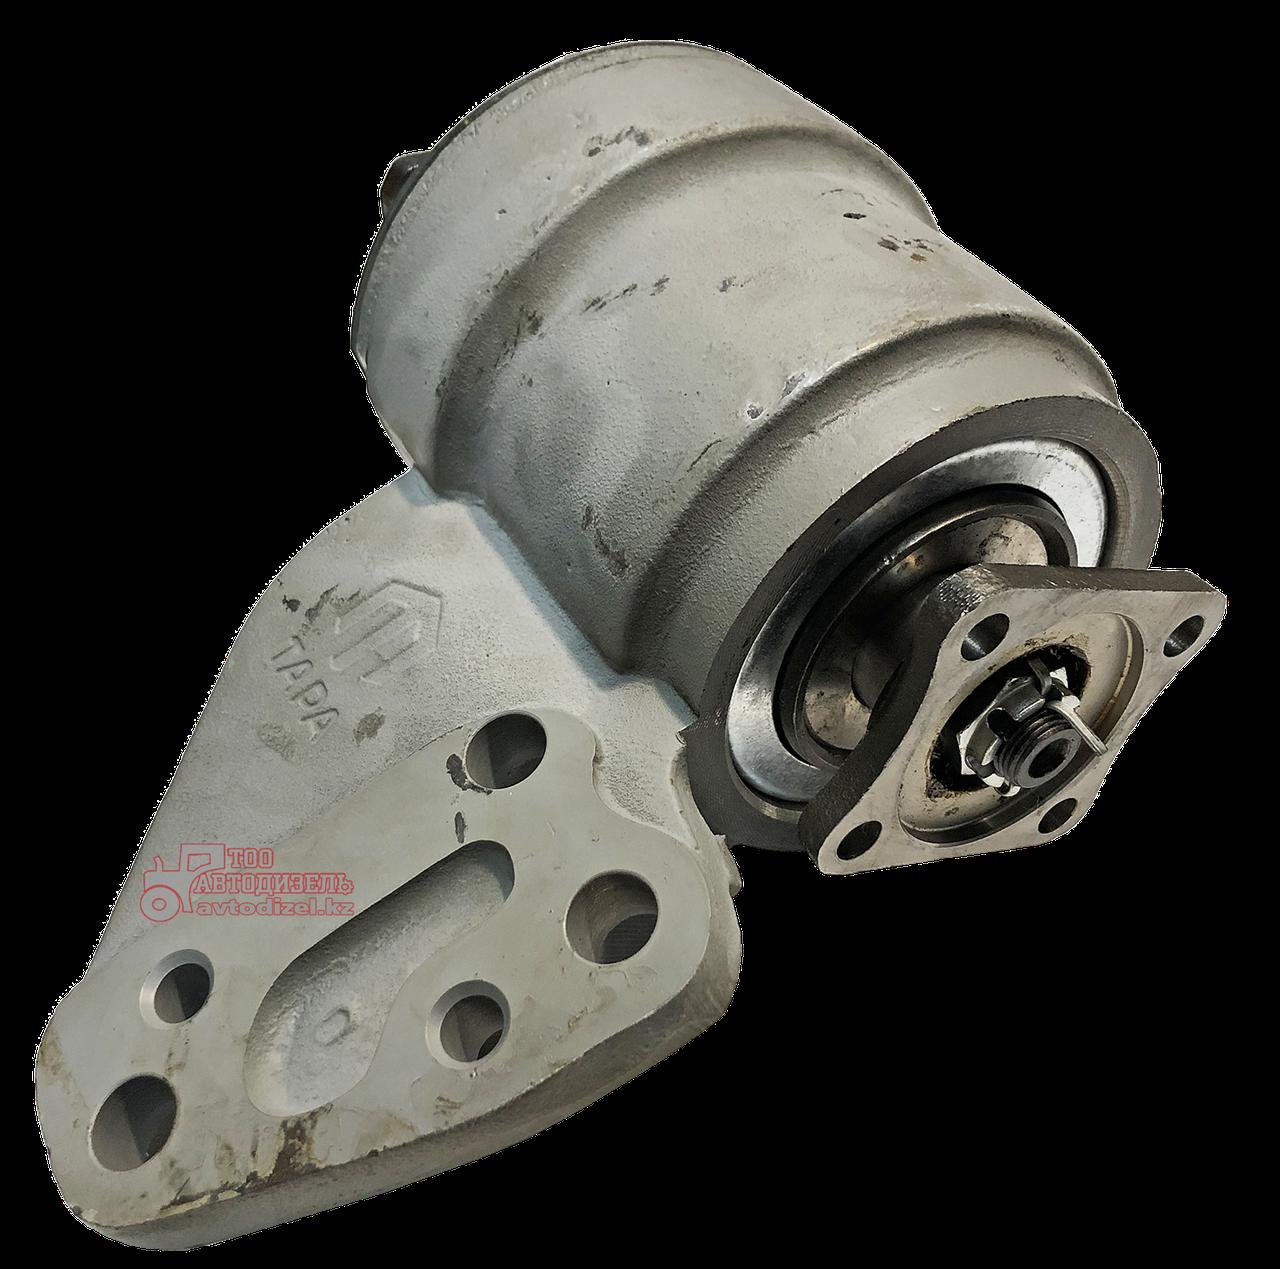 Опора 72-2209010-А карданного вала промежуточная МТЗ-82 в сборе ТАРА